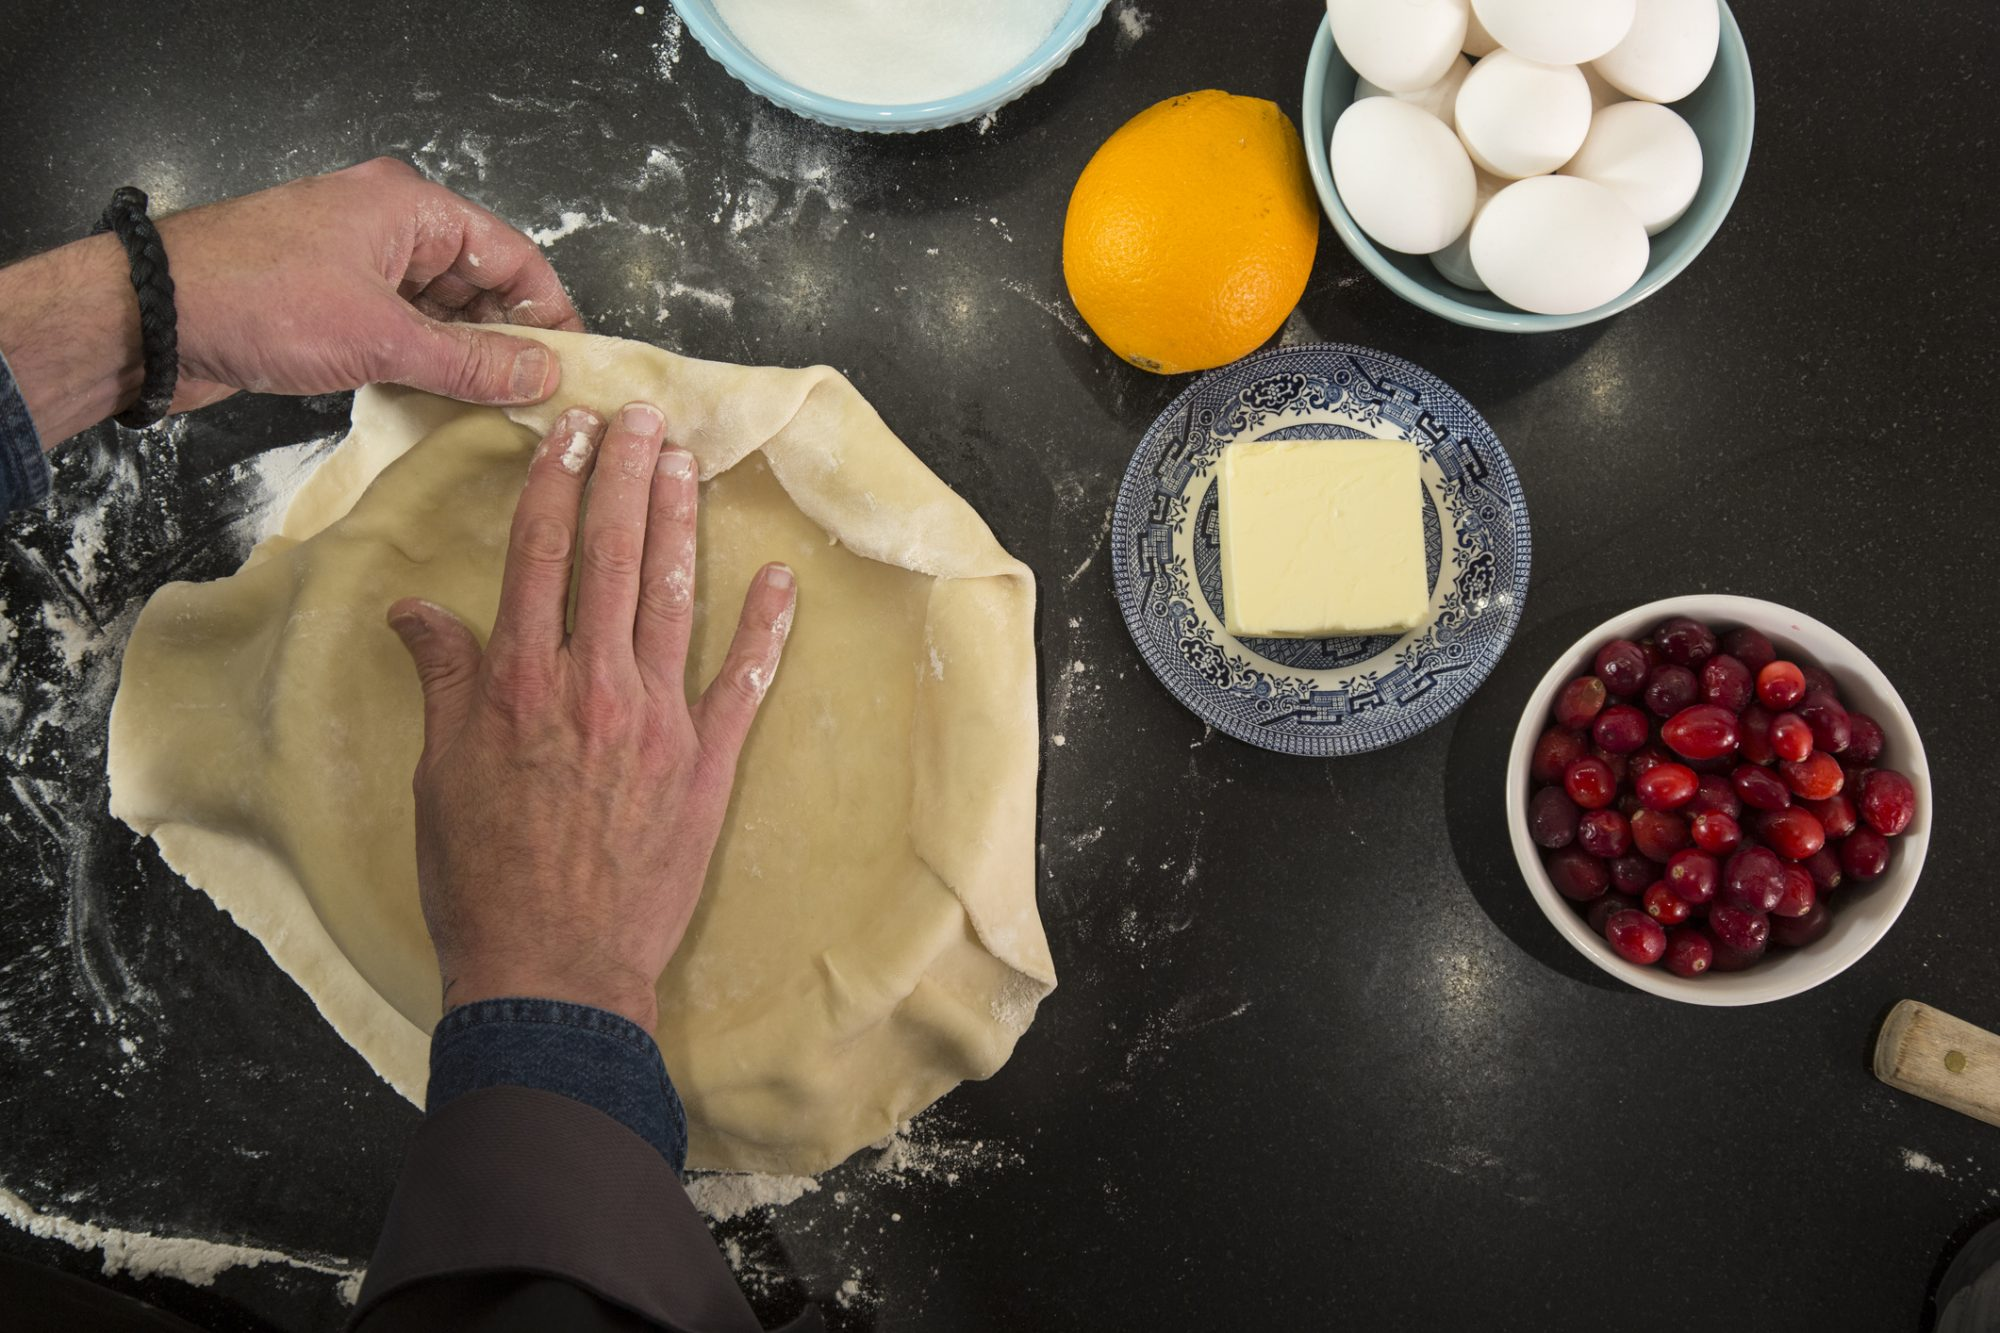 pie_dough_mistakes.jpg